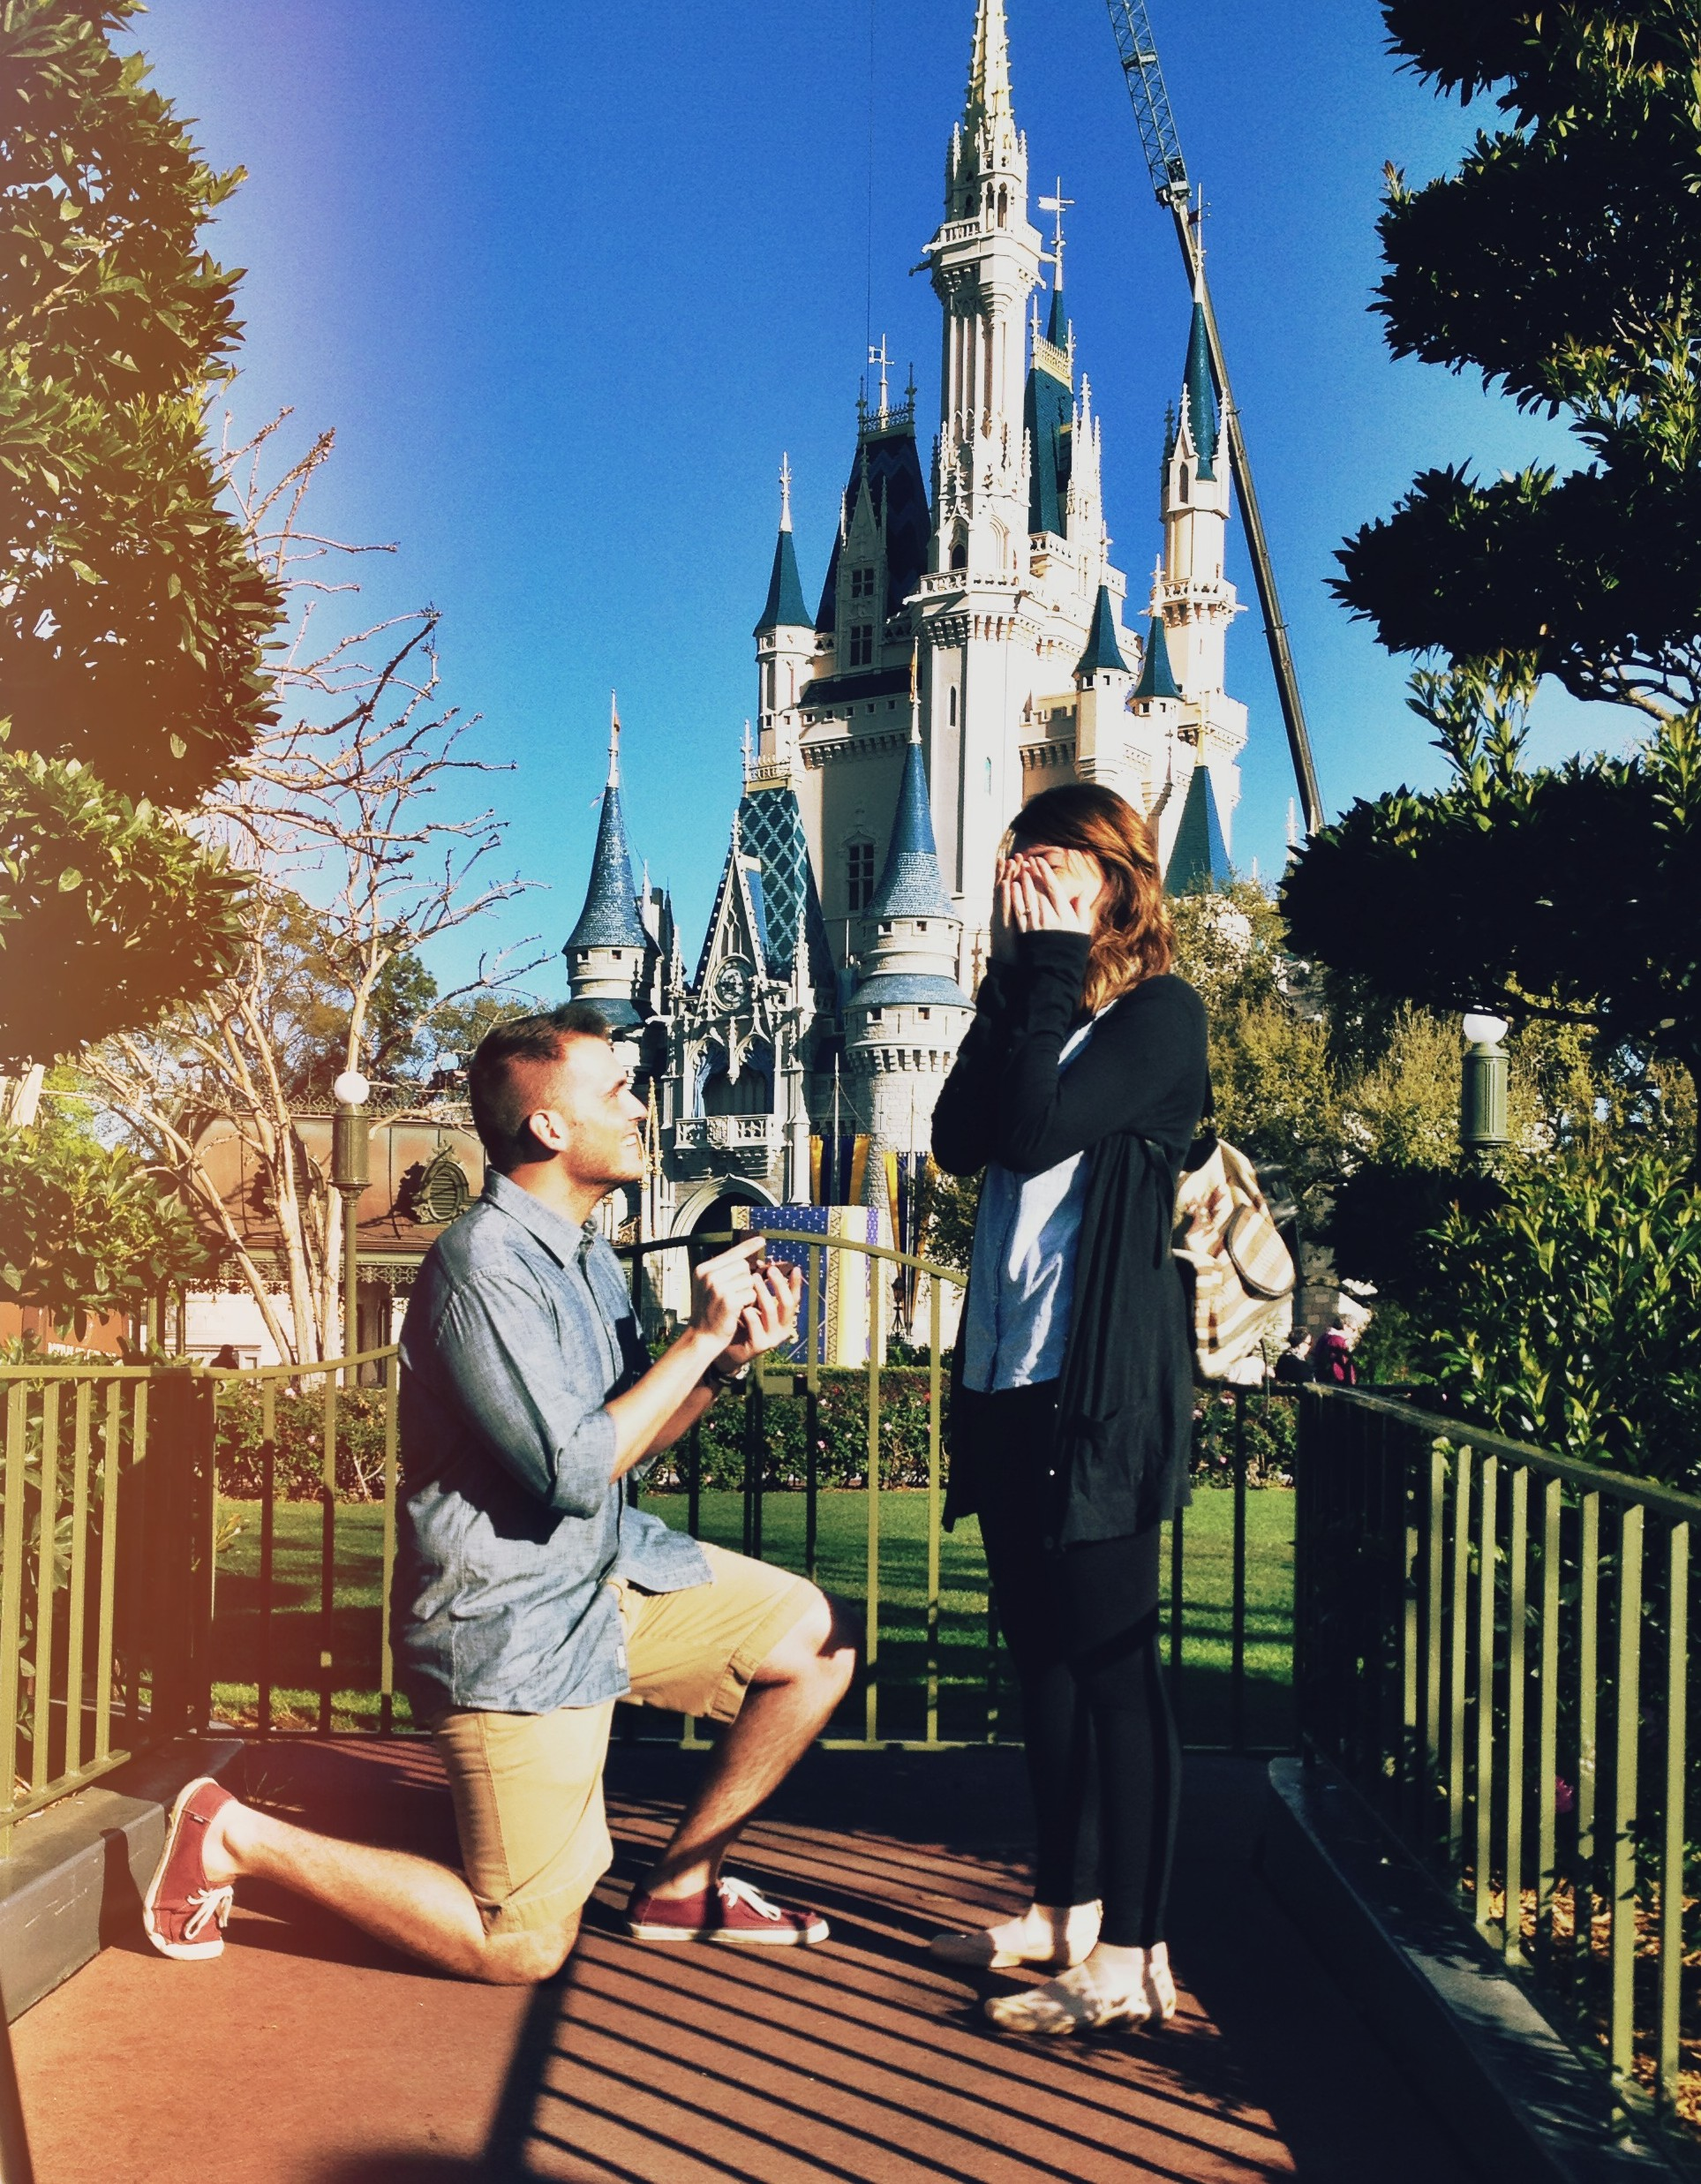 Image 2 of Mallory and Davis Proposal at Disney